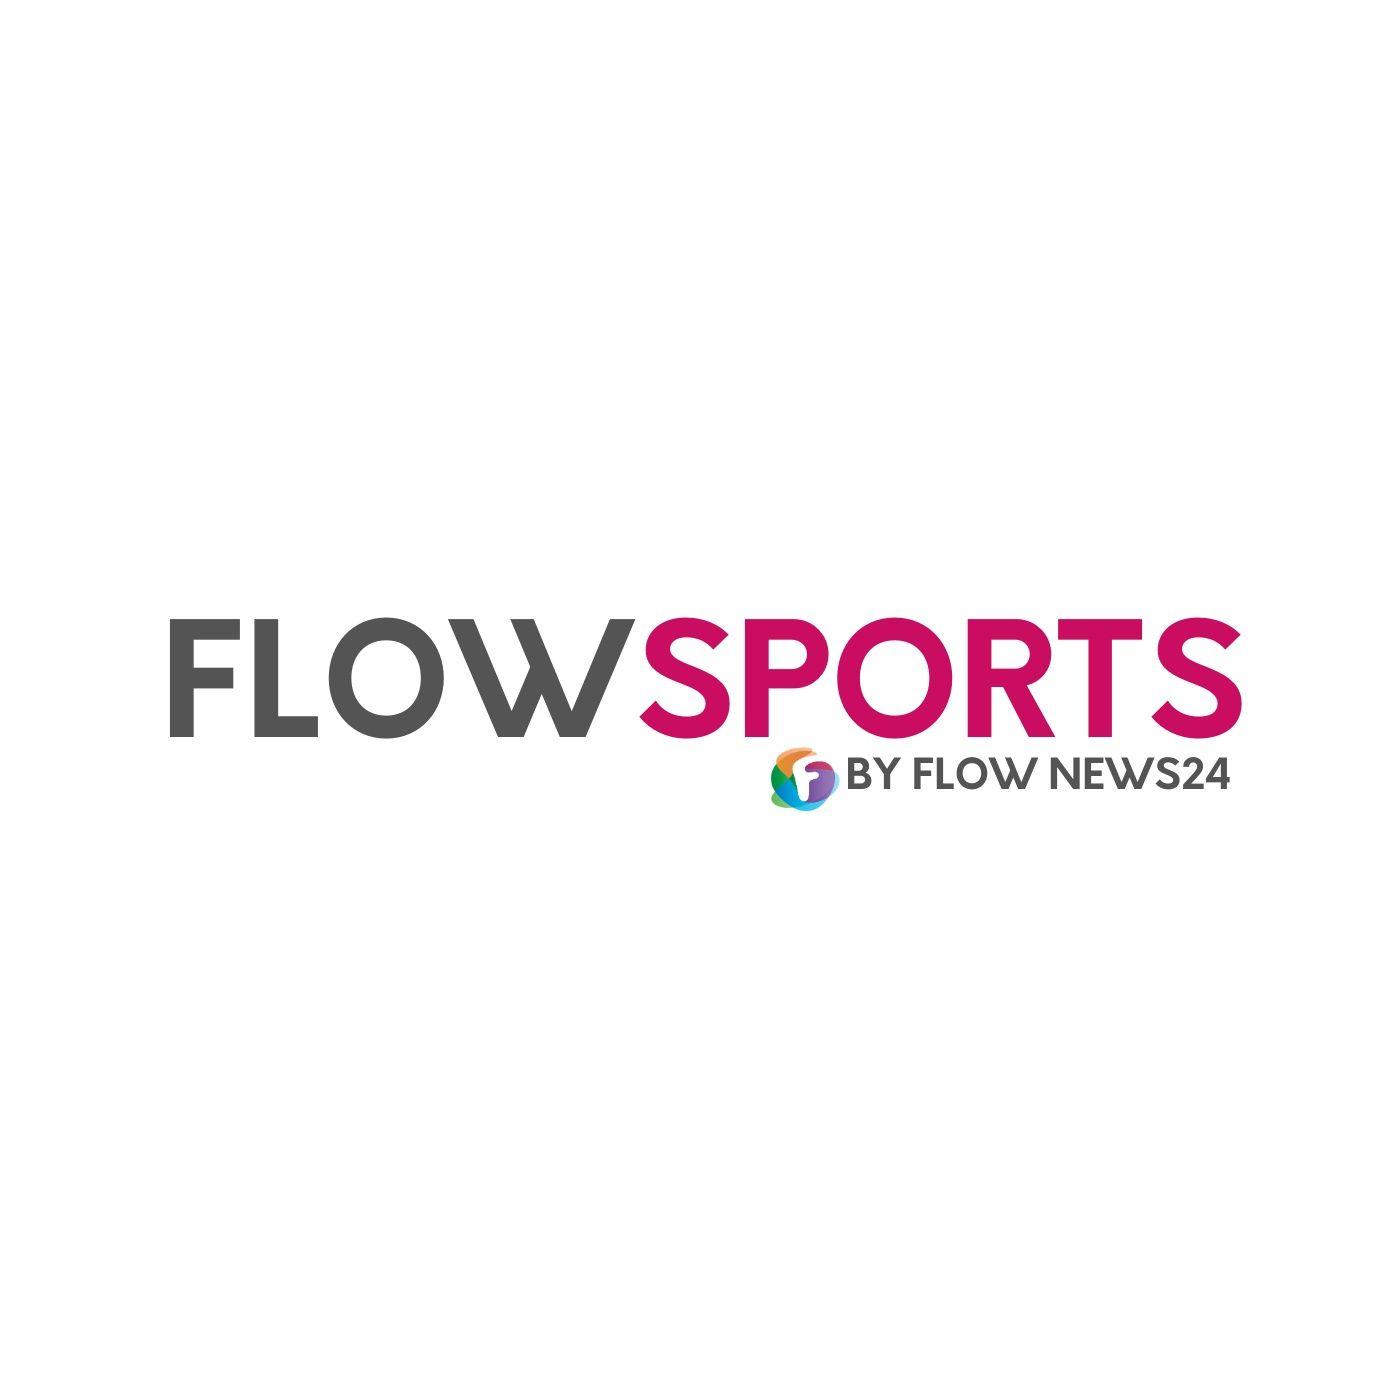 Wayne 'Flowman' Phillips and Jason 'Statman' Regan talk French Open Tennis